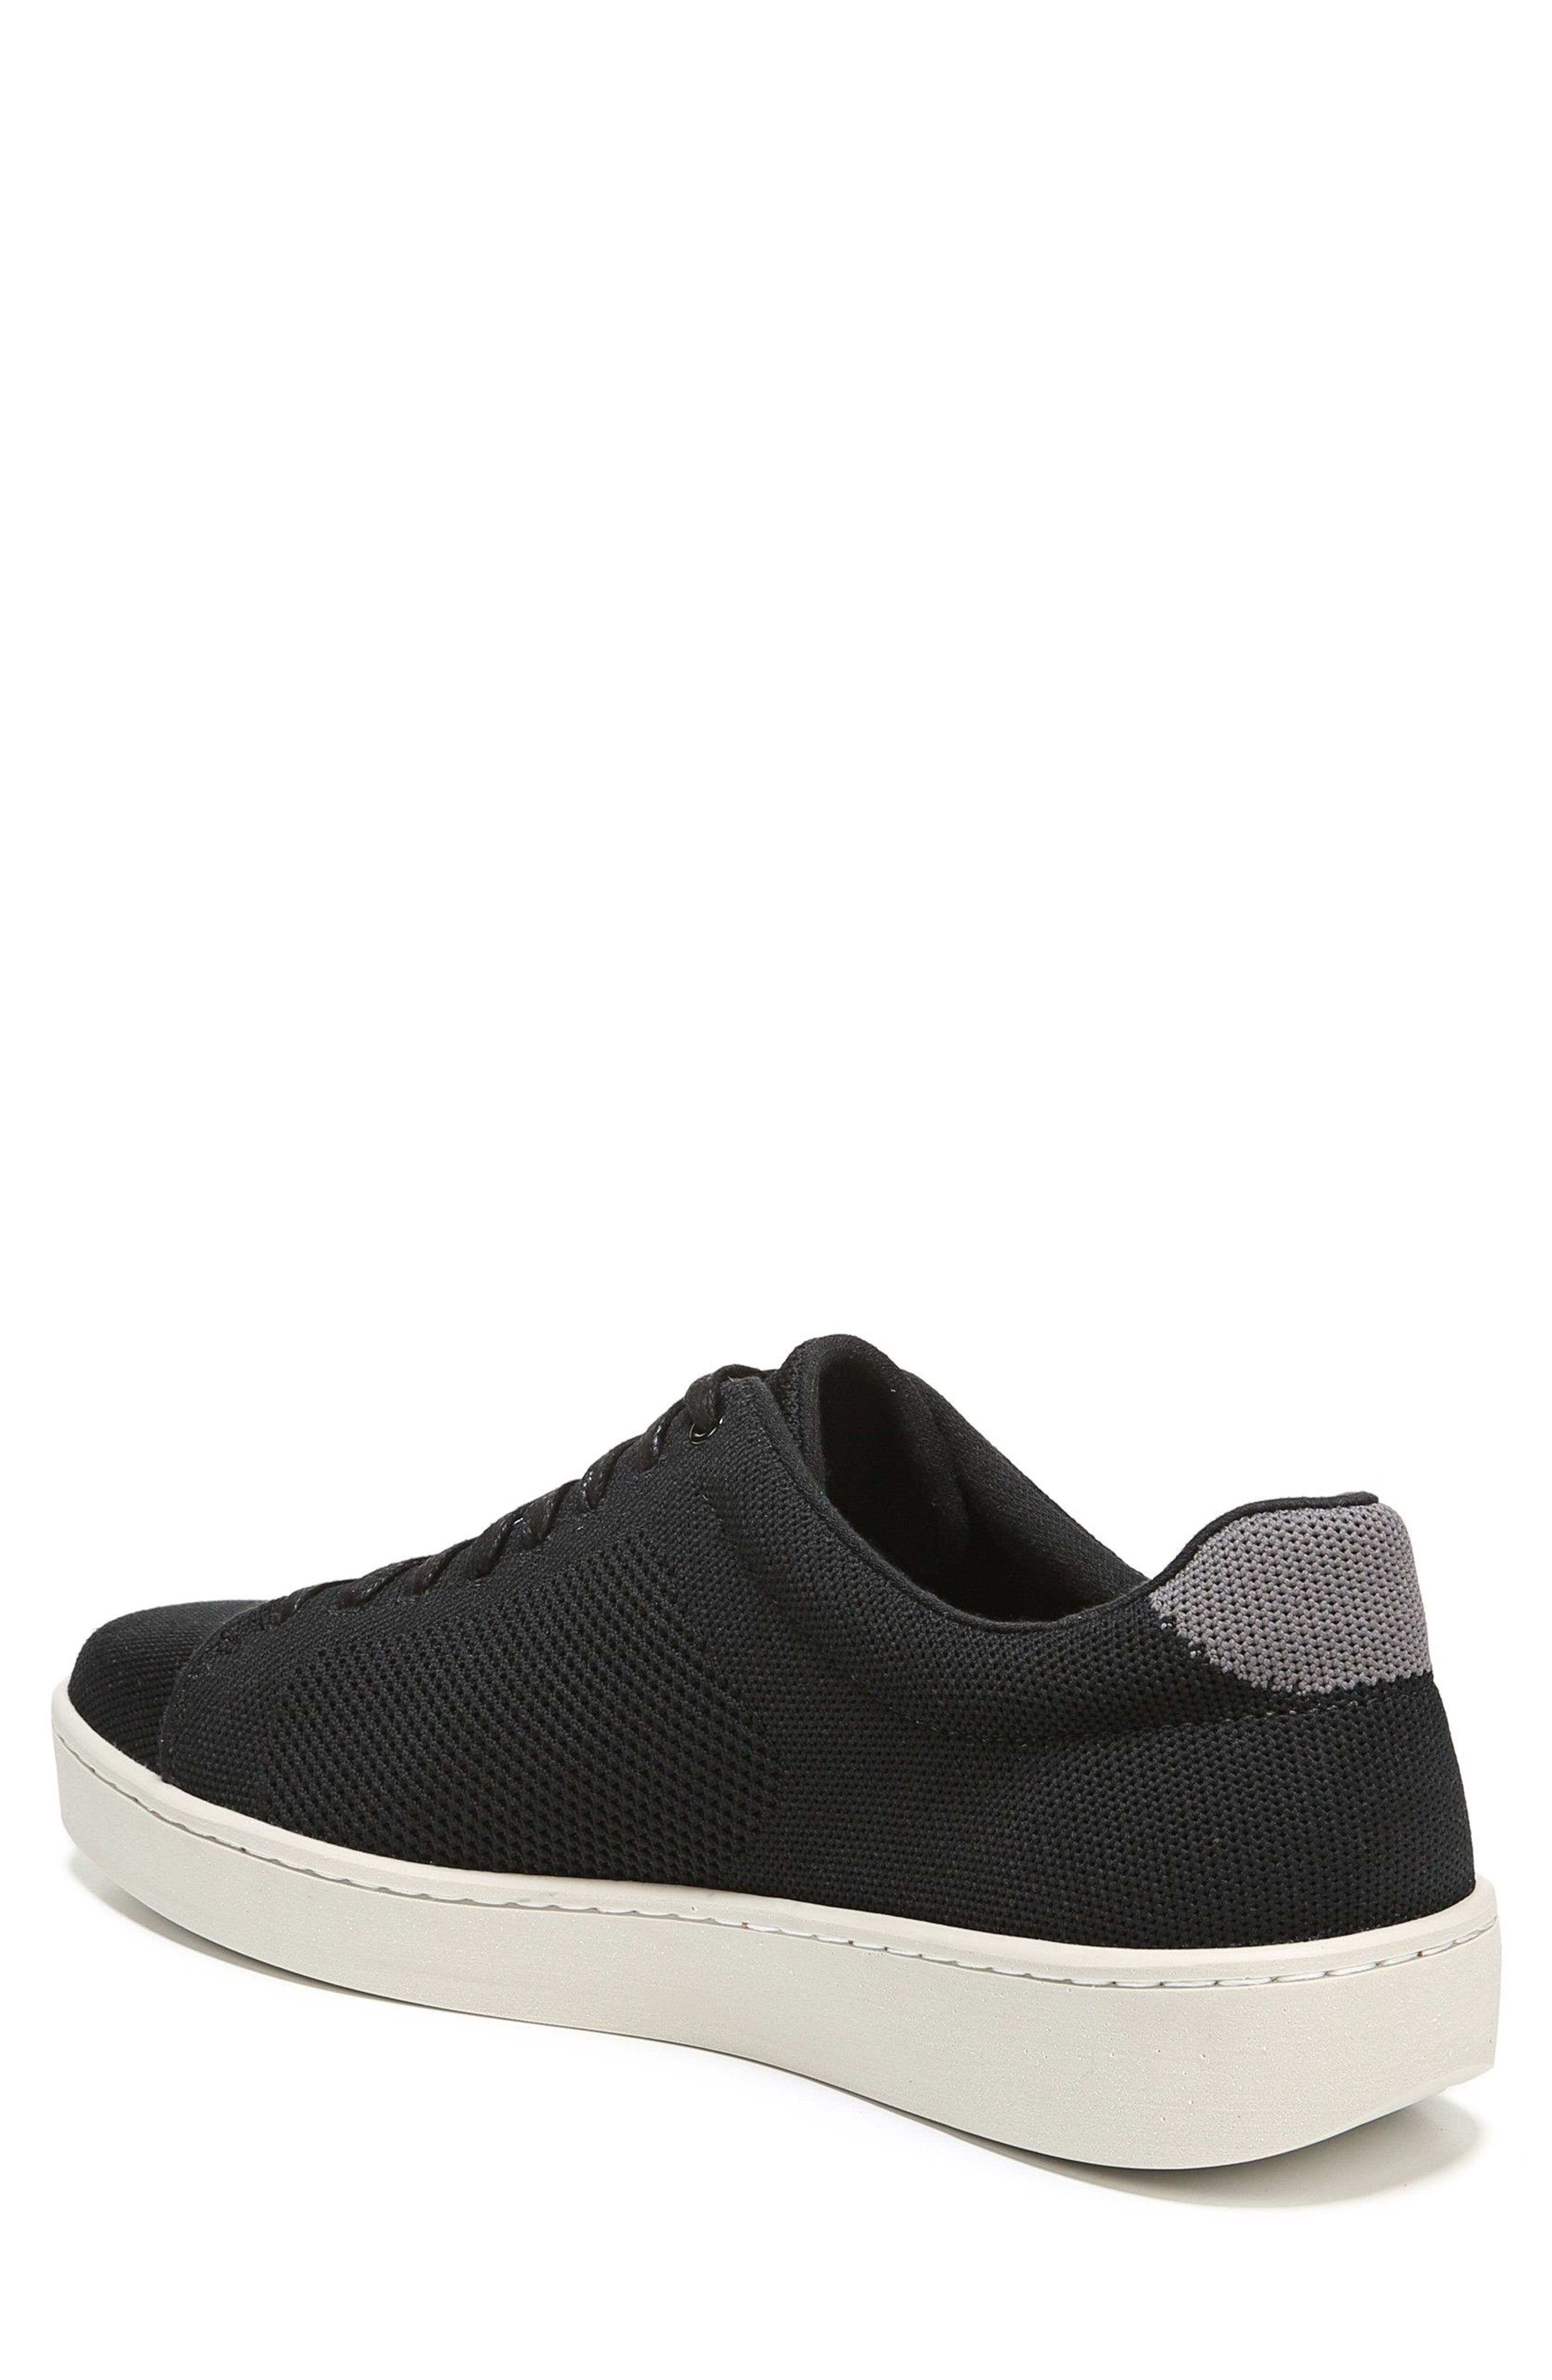 Silos Knit Low Top Sneaker,                             Alternate thumbnail 2, color,                             BLACK/ GRAPHITE